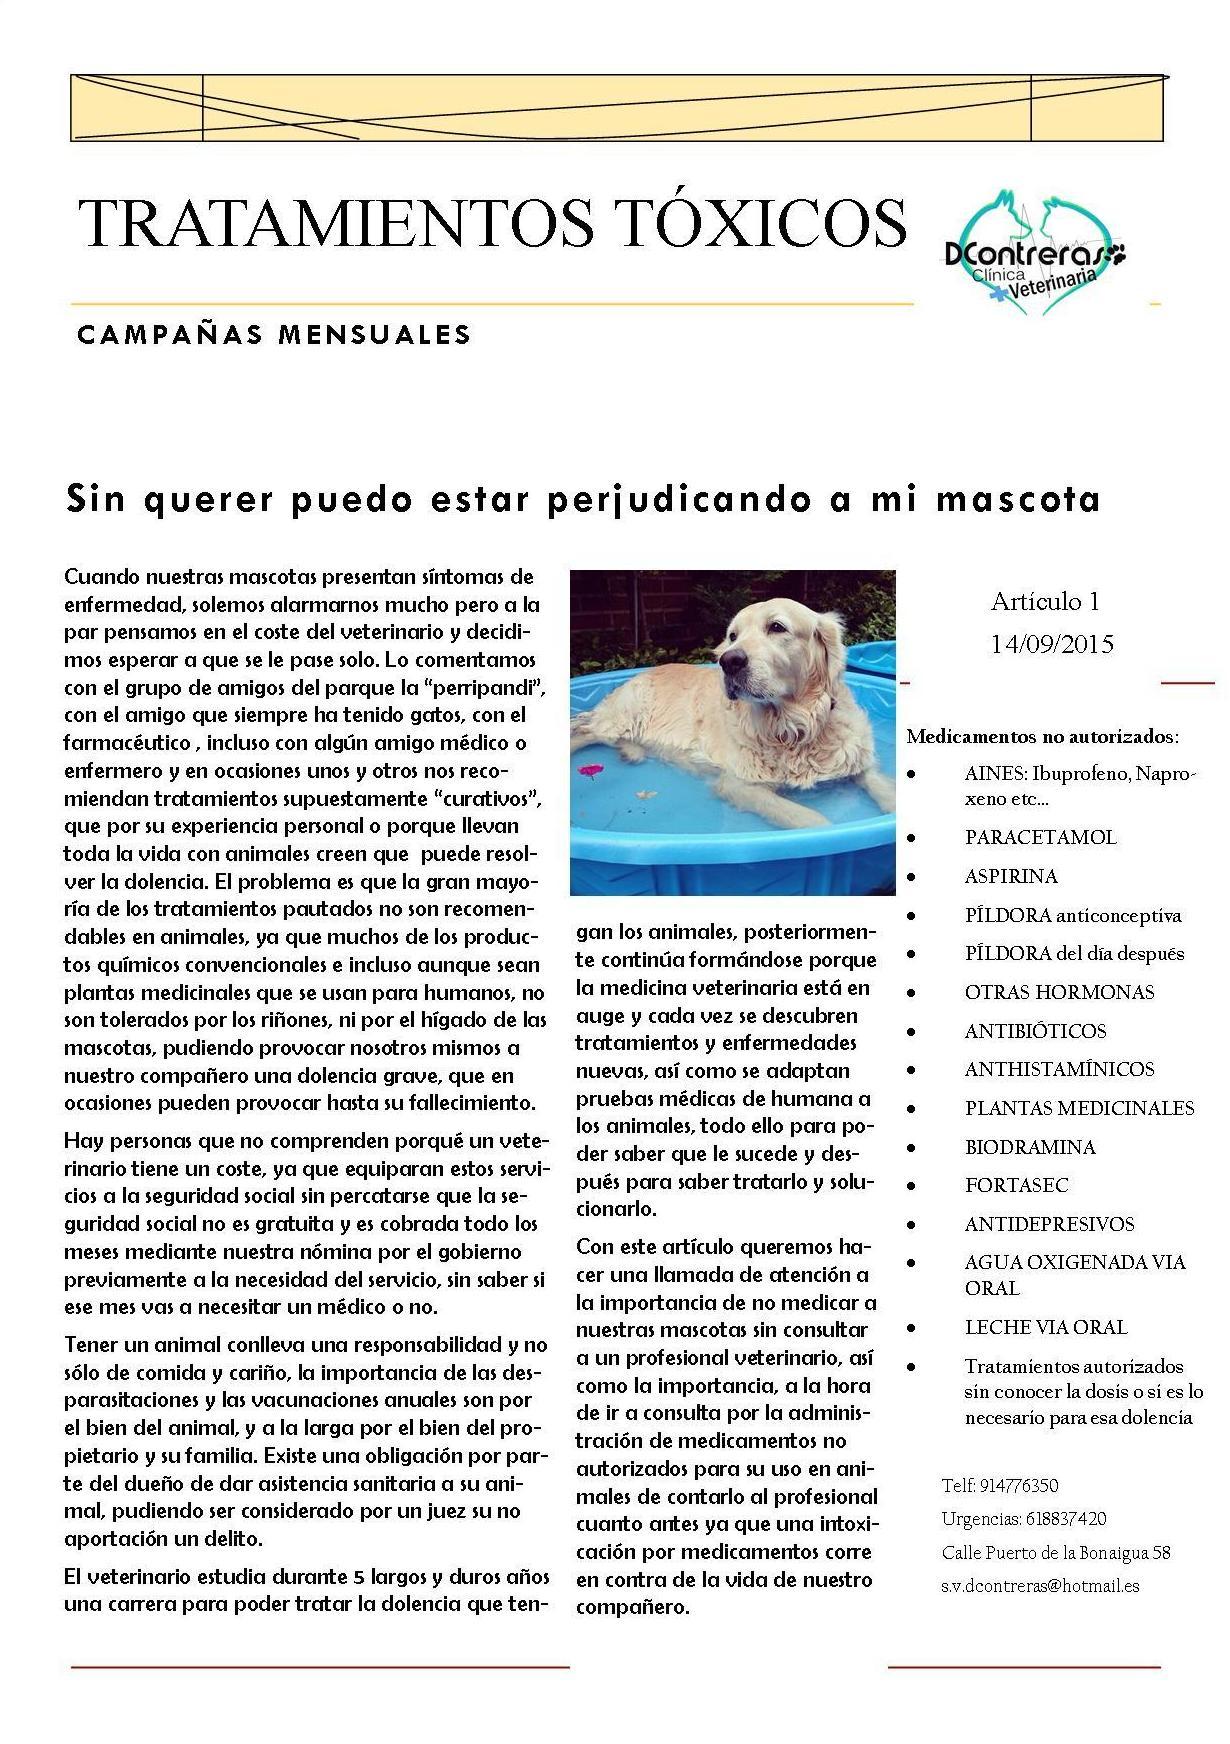 clinica veterinaria en vallecas